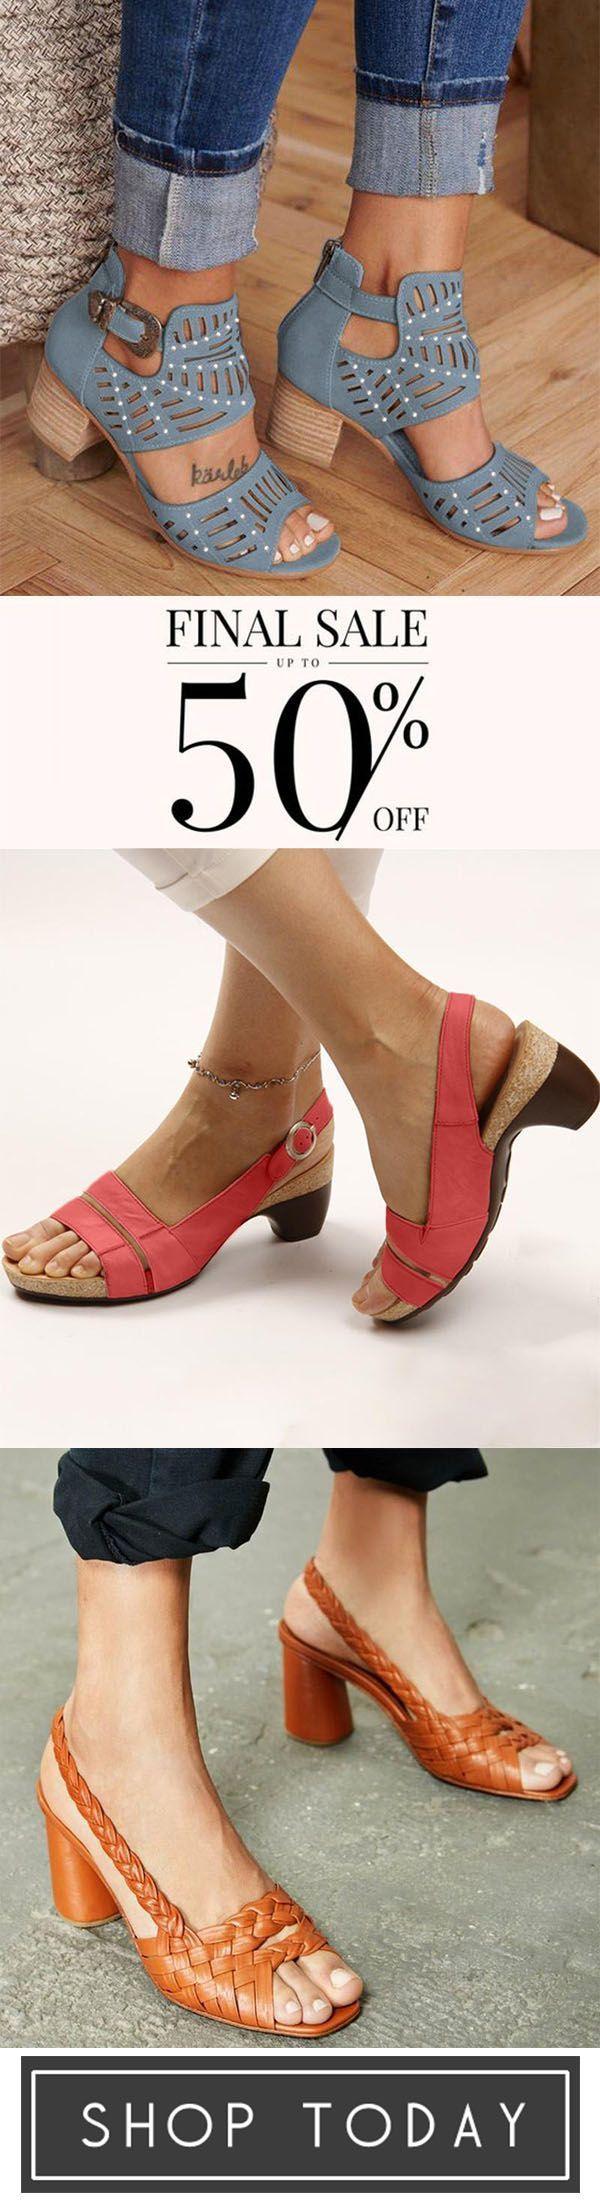 Women shoes Classy Flats – #WomenshoesCasualPolyvore – Trendy Women shoes Casual…